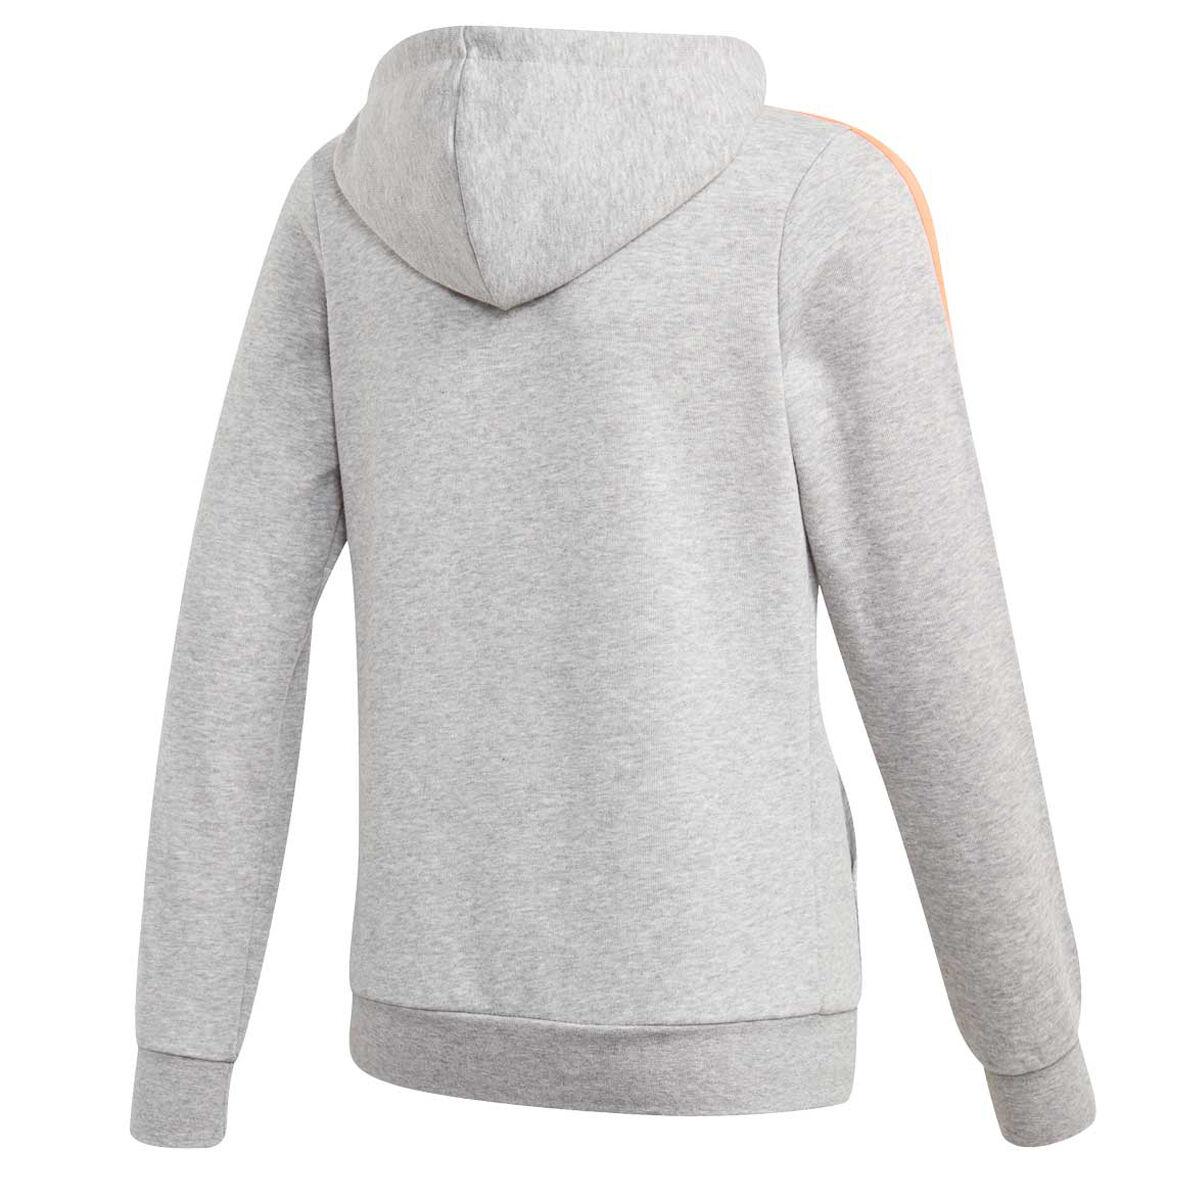 Hoodie Adidas Polar fleece Three stripes Sweater adidas